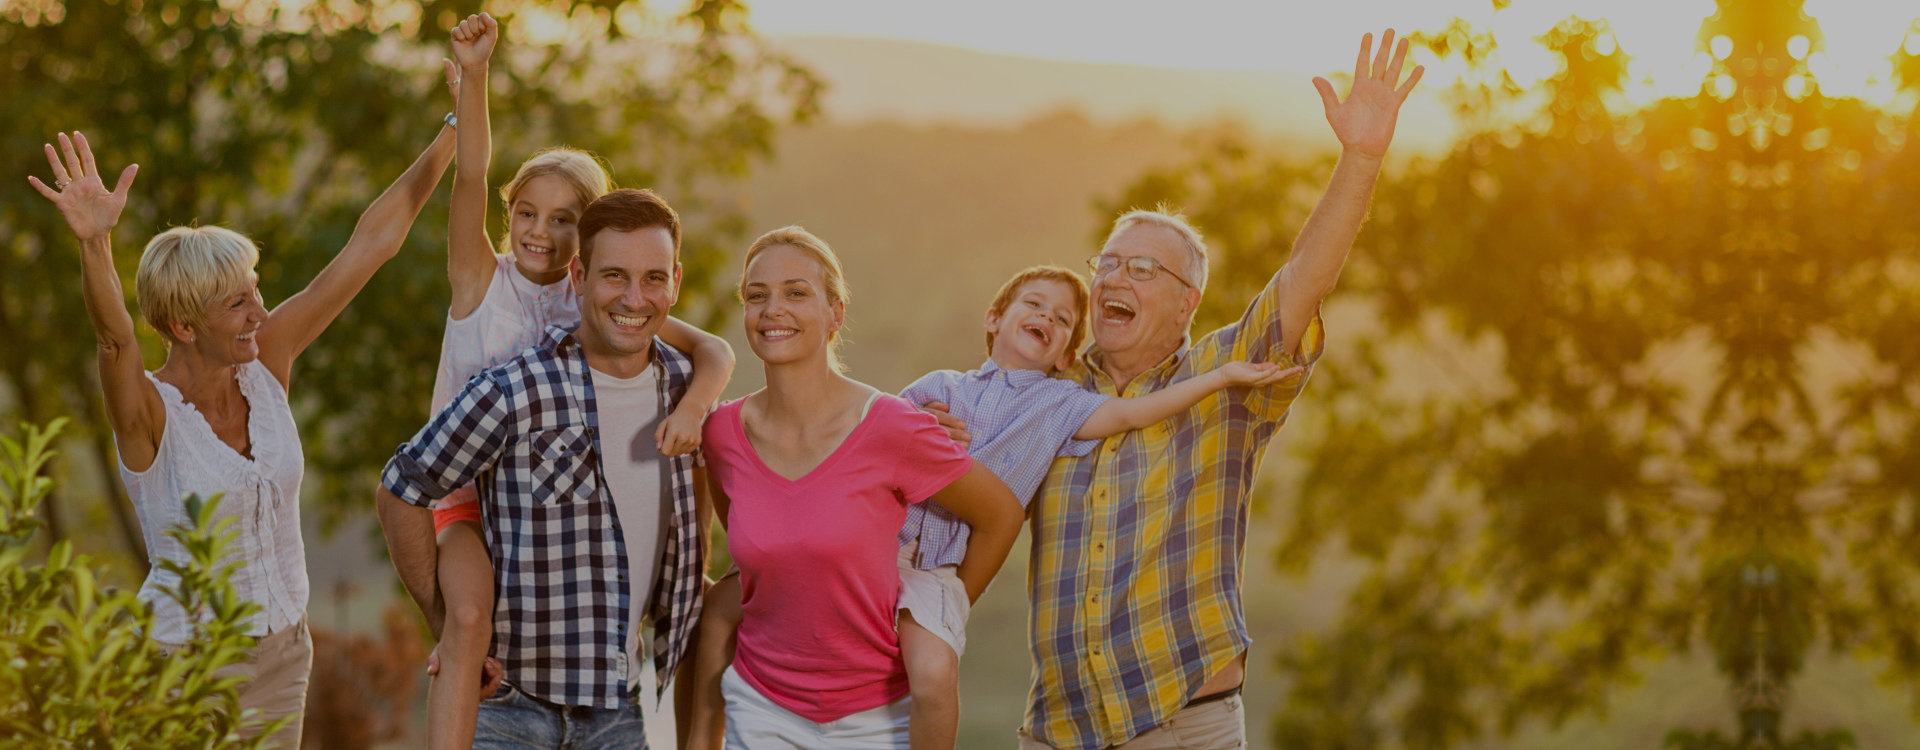 happy-family-4